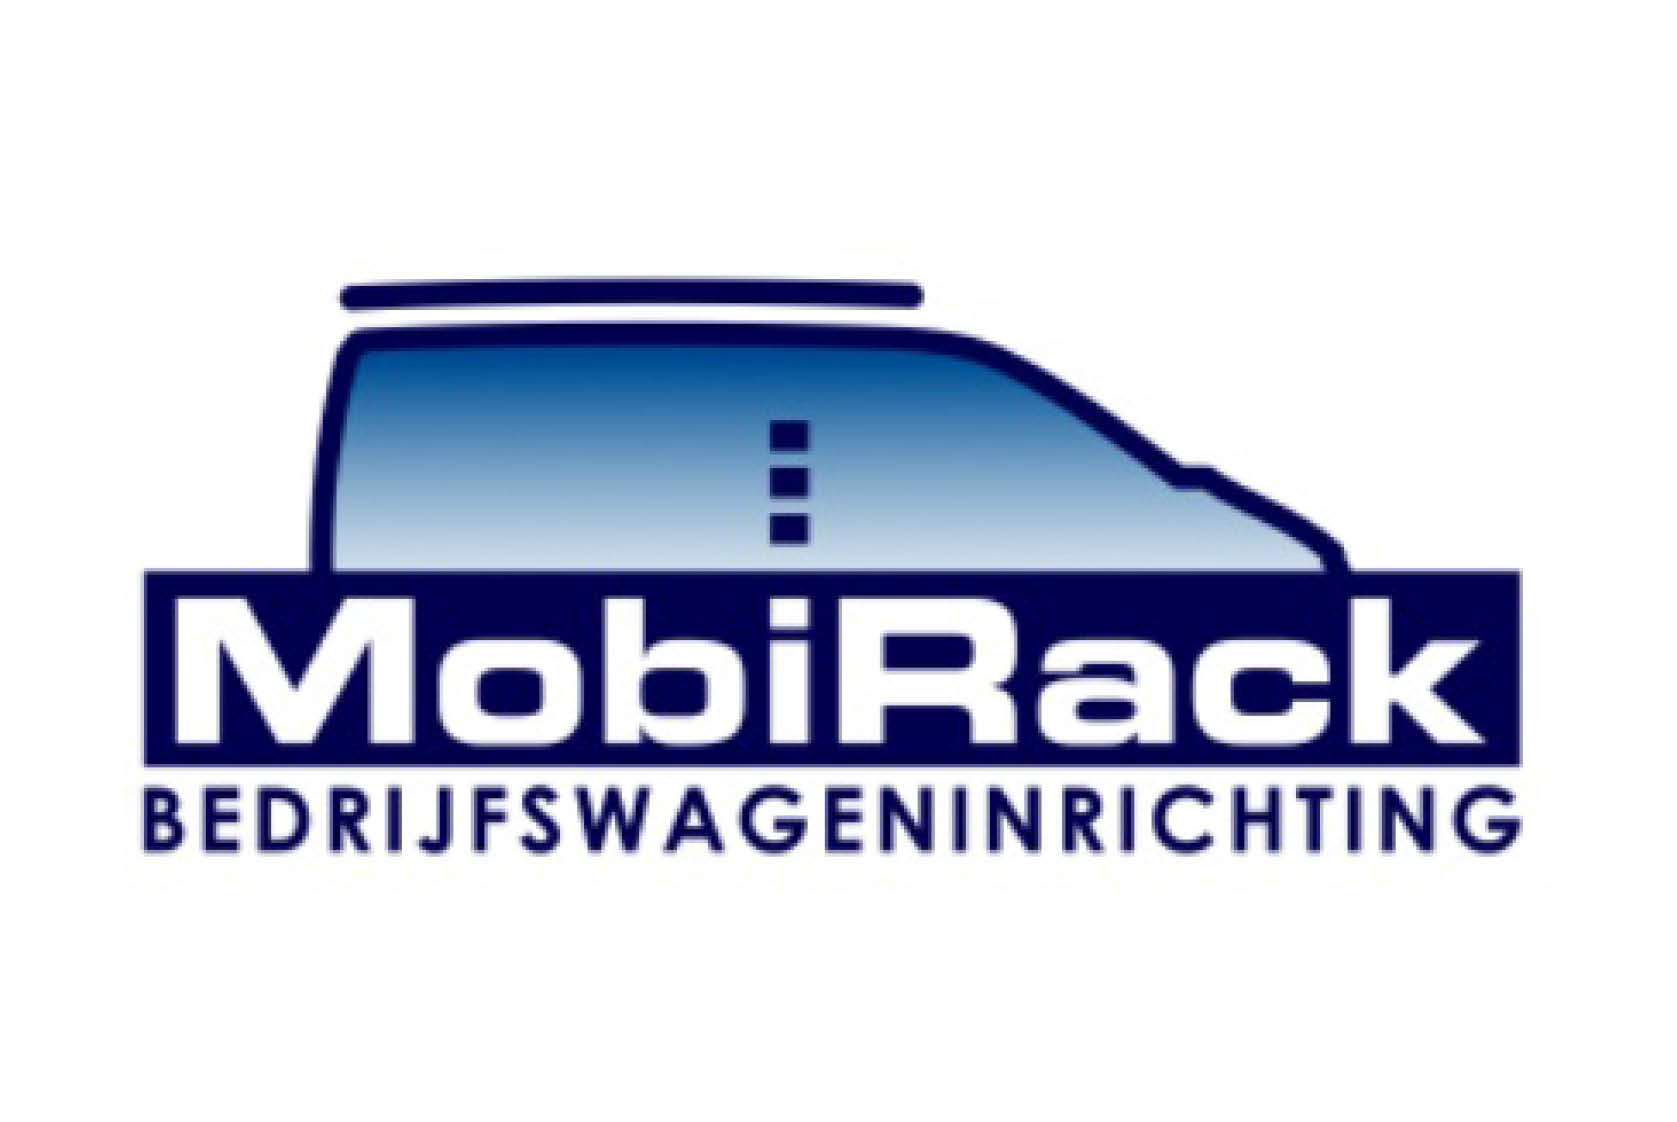 Mobirack